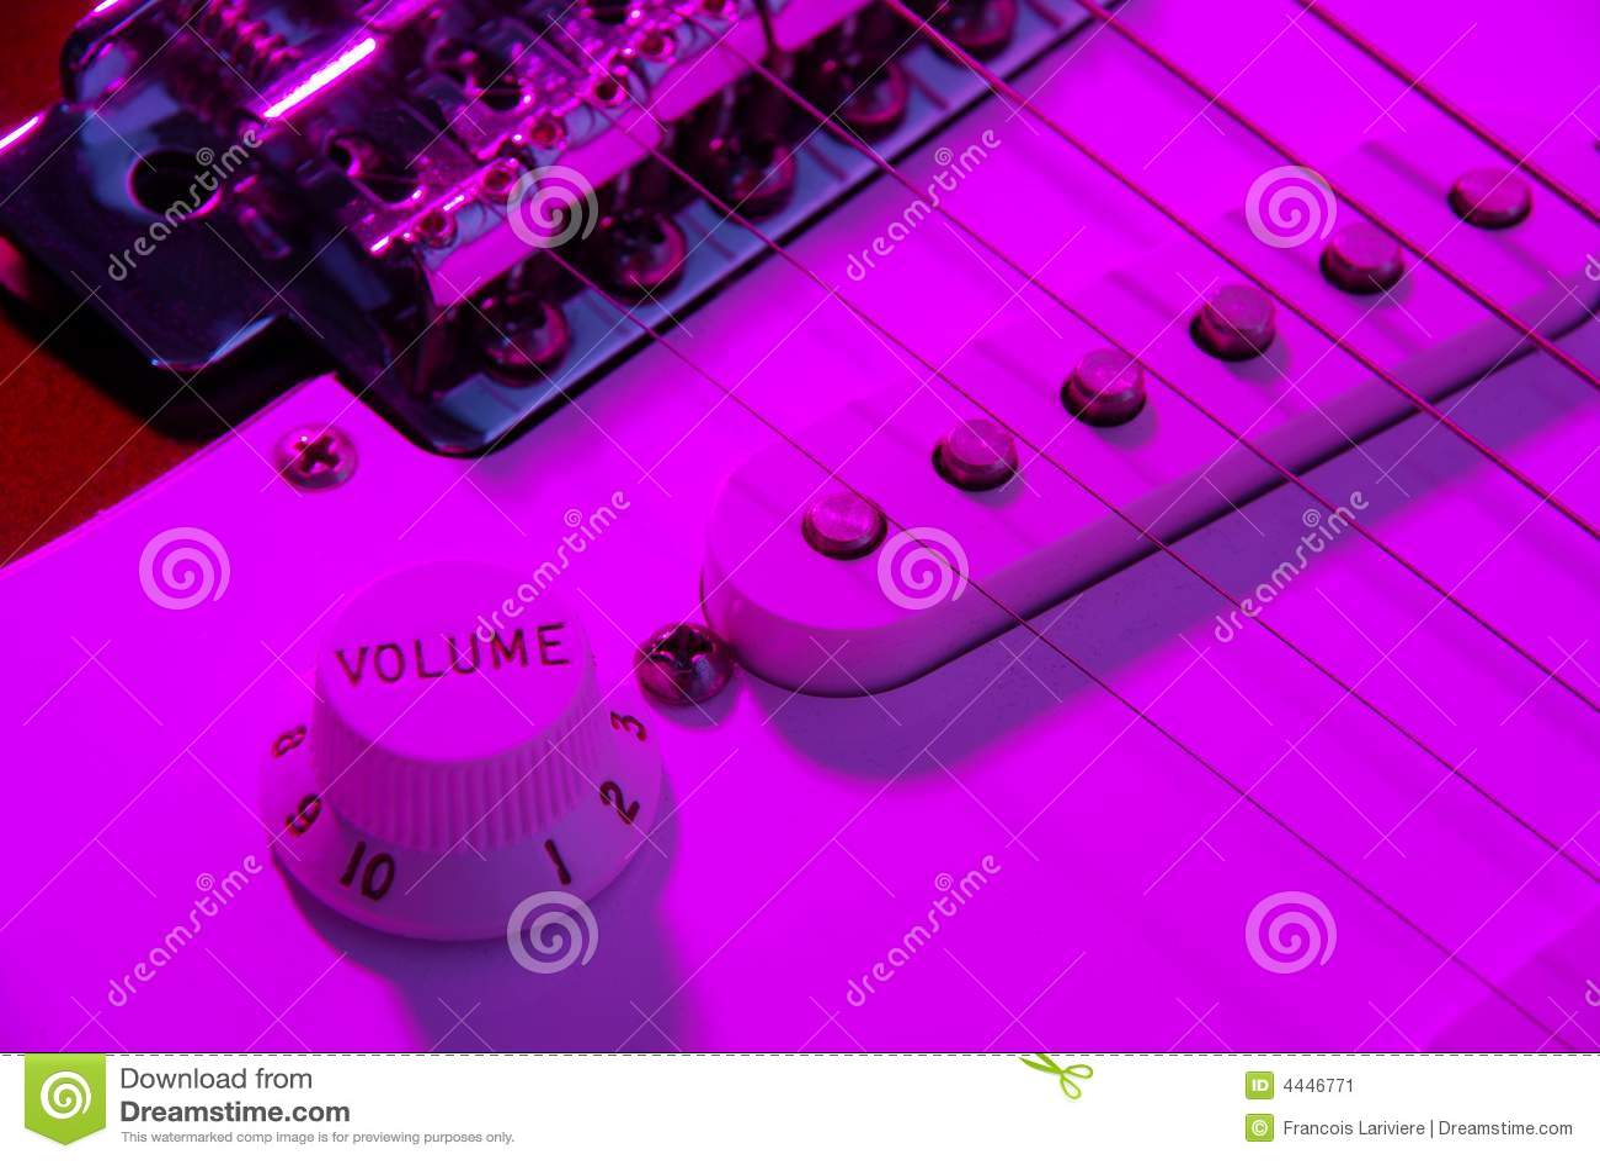 Electric guitar volume